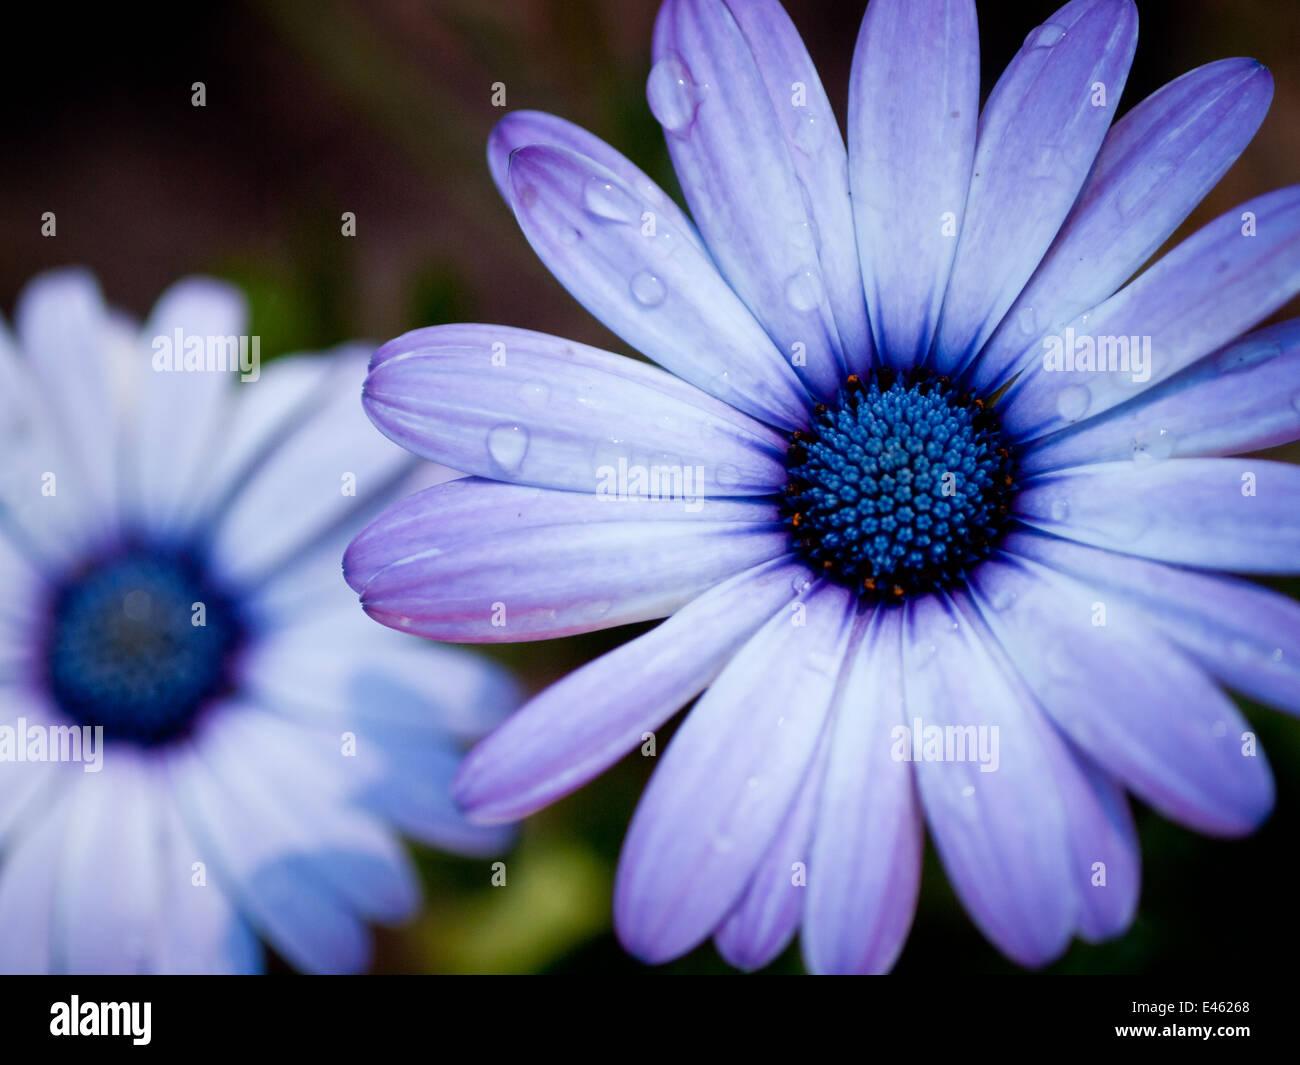 A blue-eyed daisy (Osteospermum flower), also known as an African daisy, South African daisy and Cape daisy.  Edmonton, - Stock Image